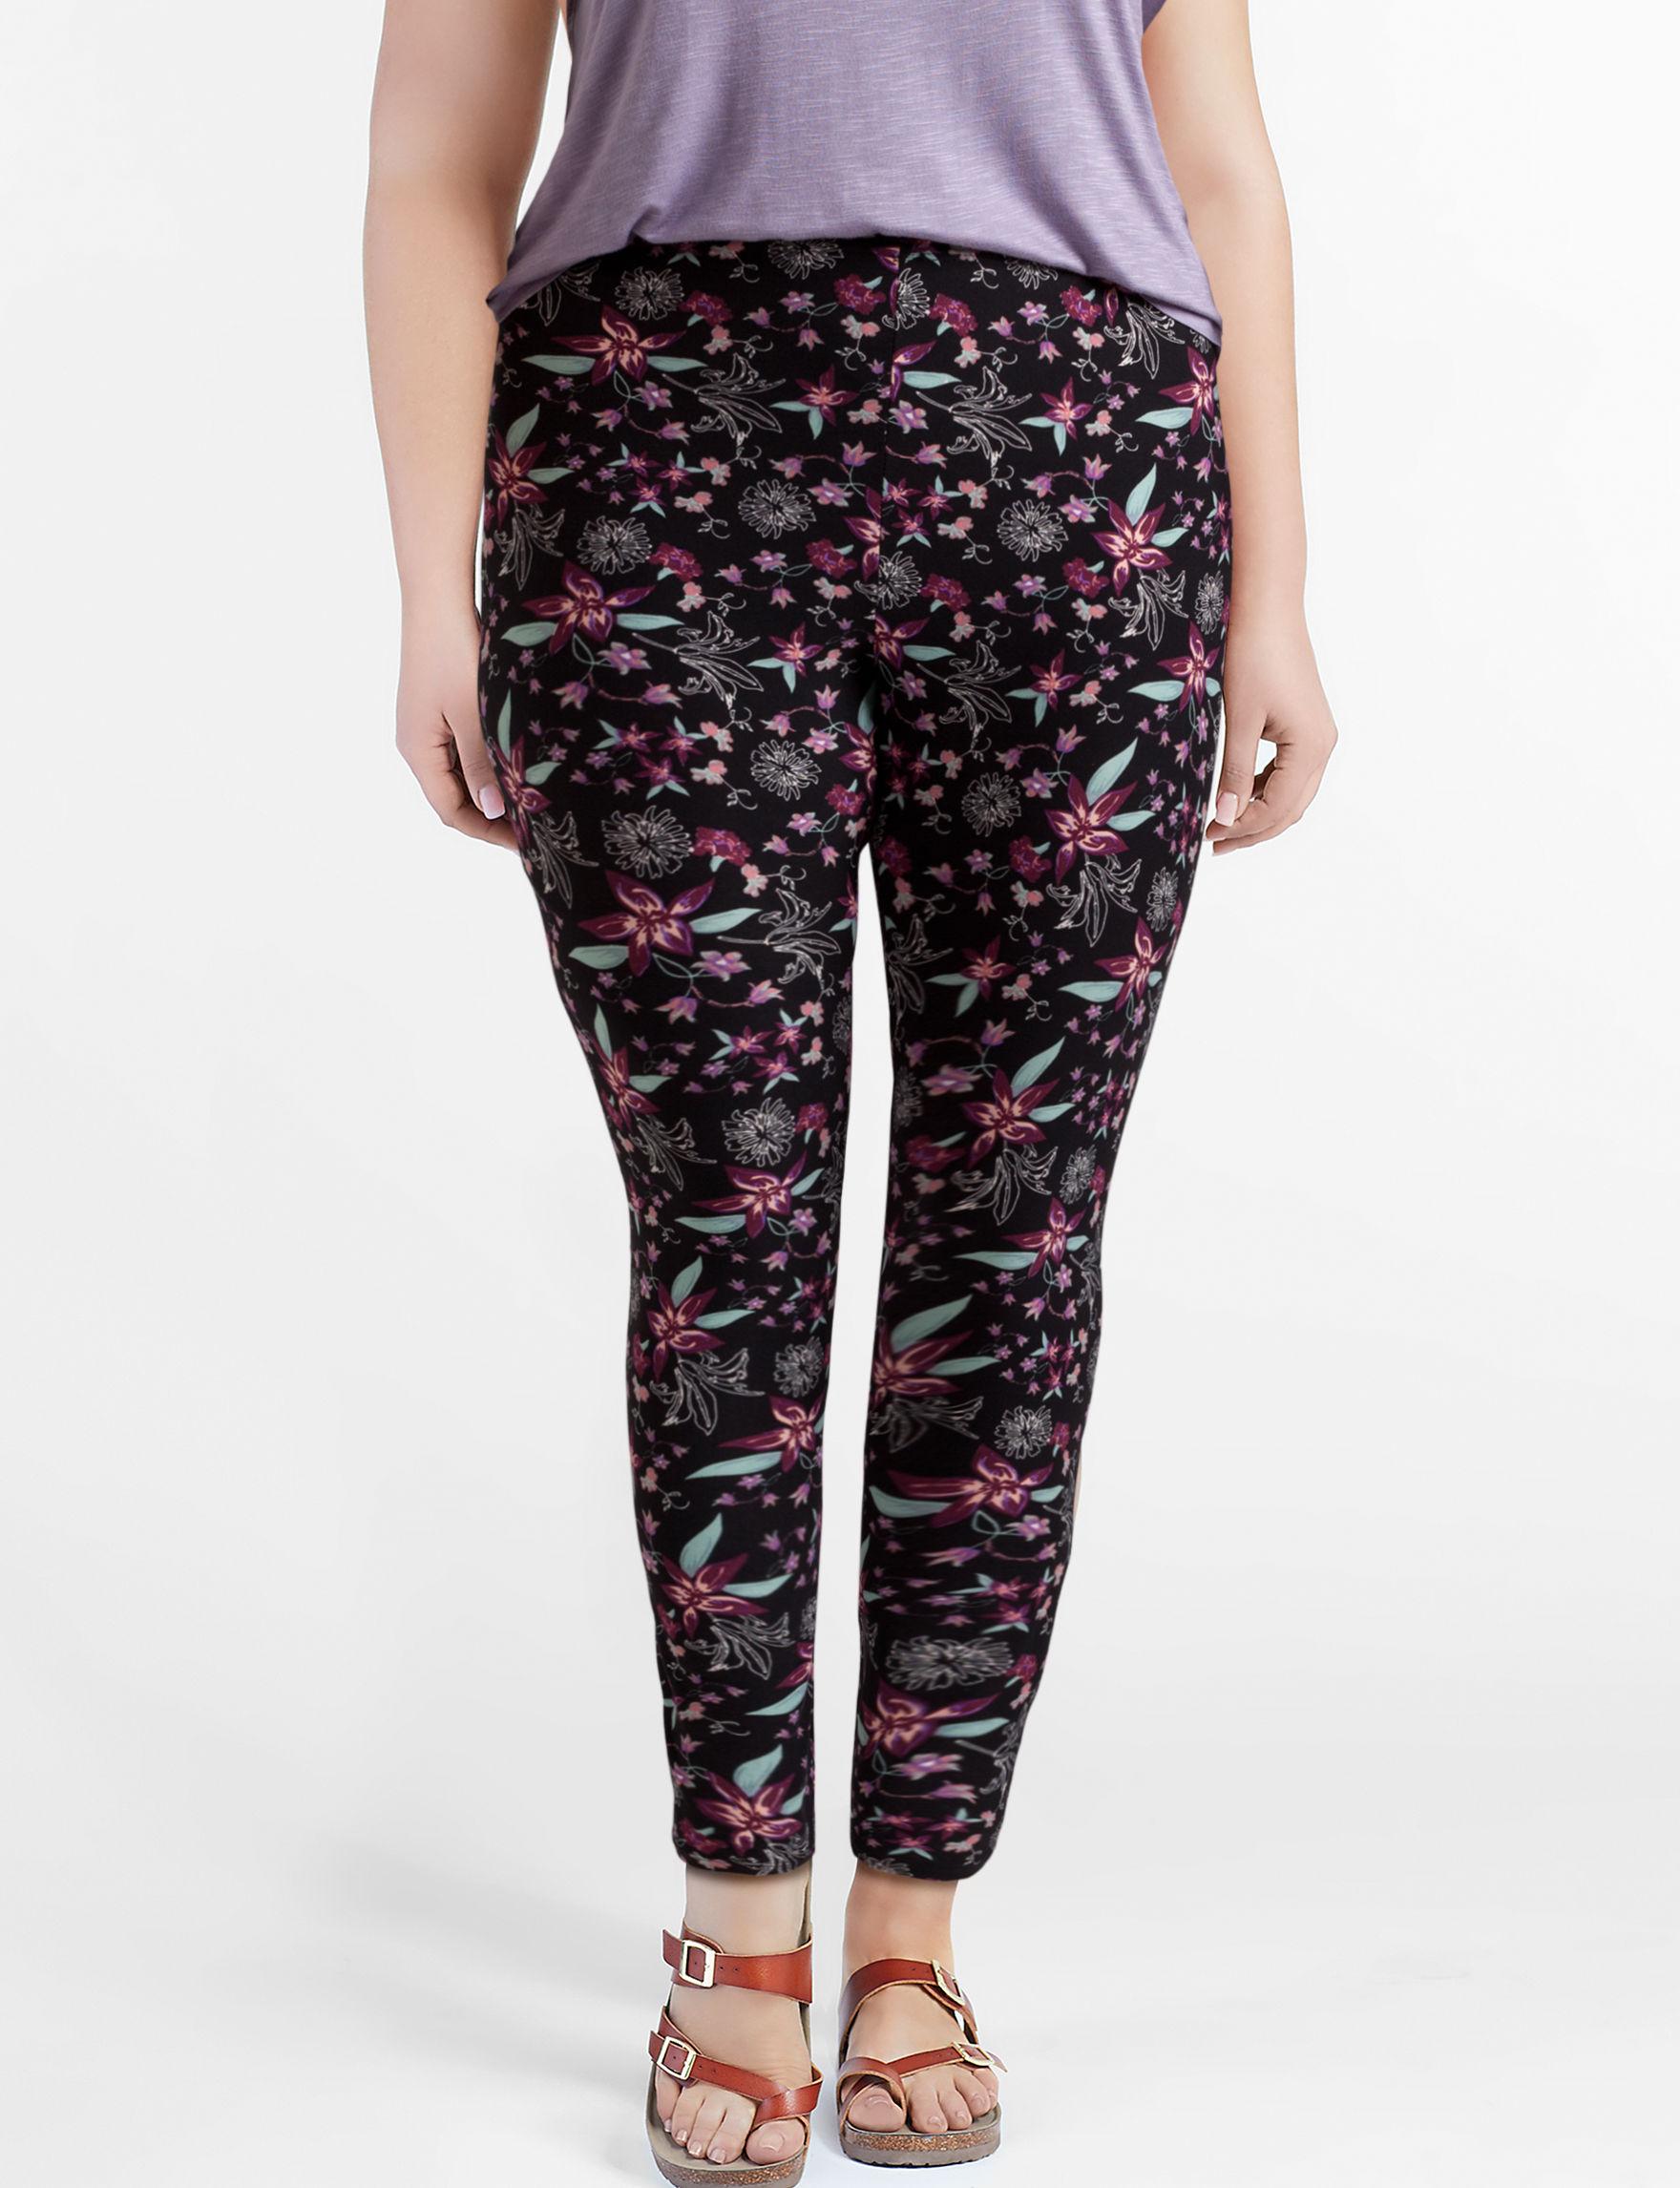 Just One Black Floral Leggings